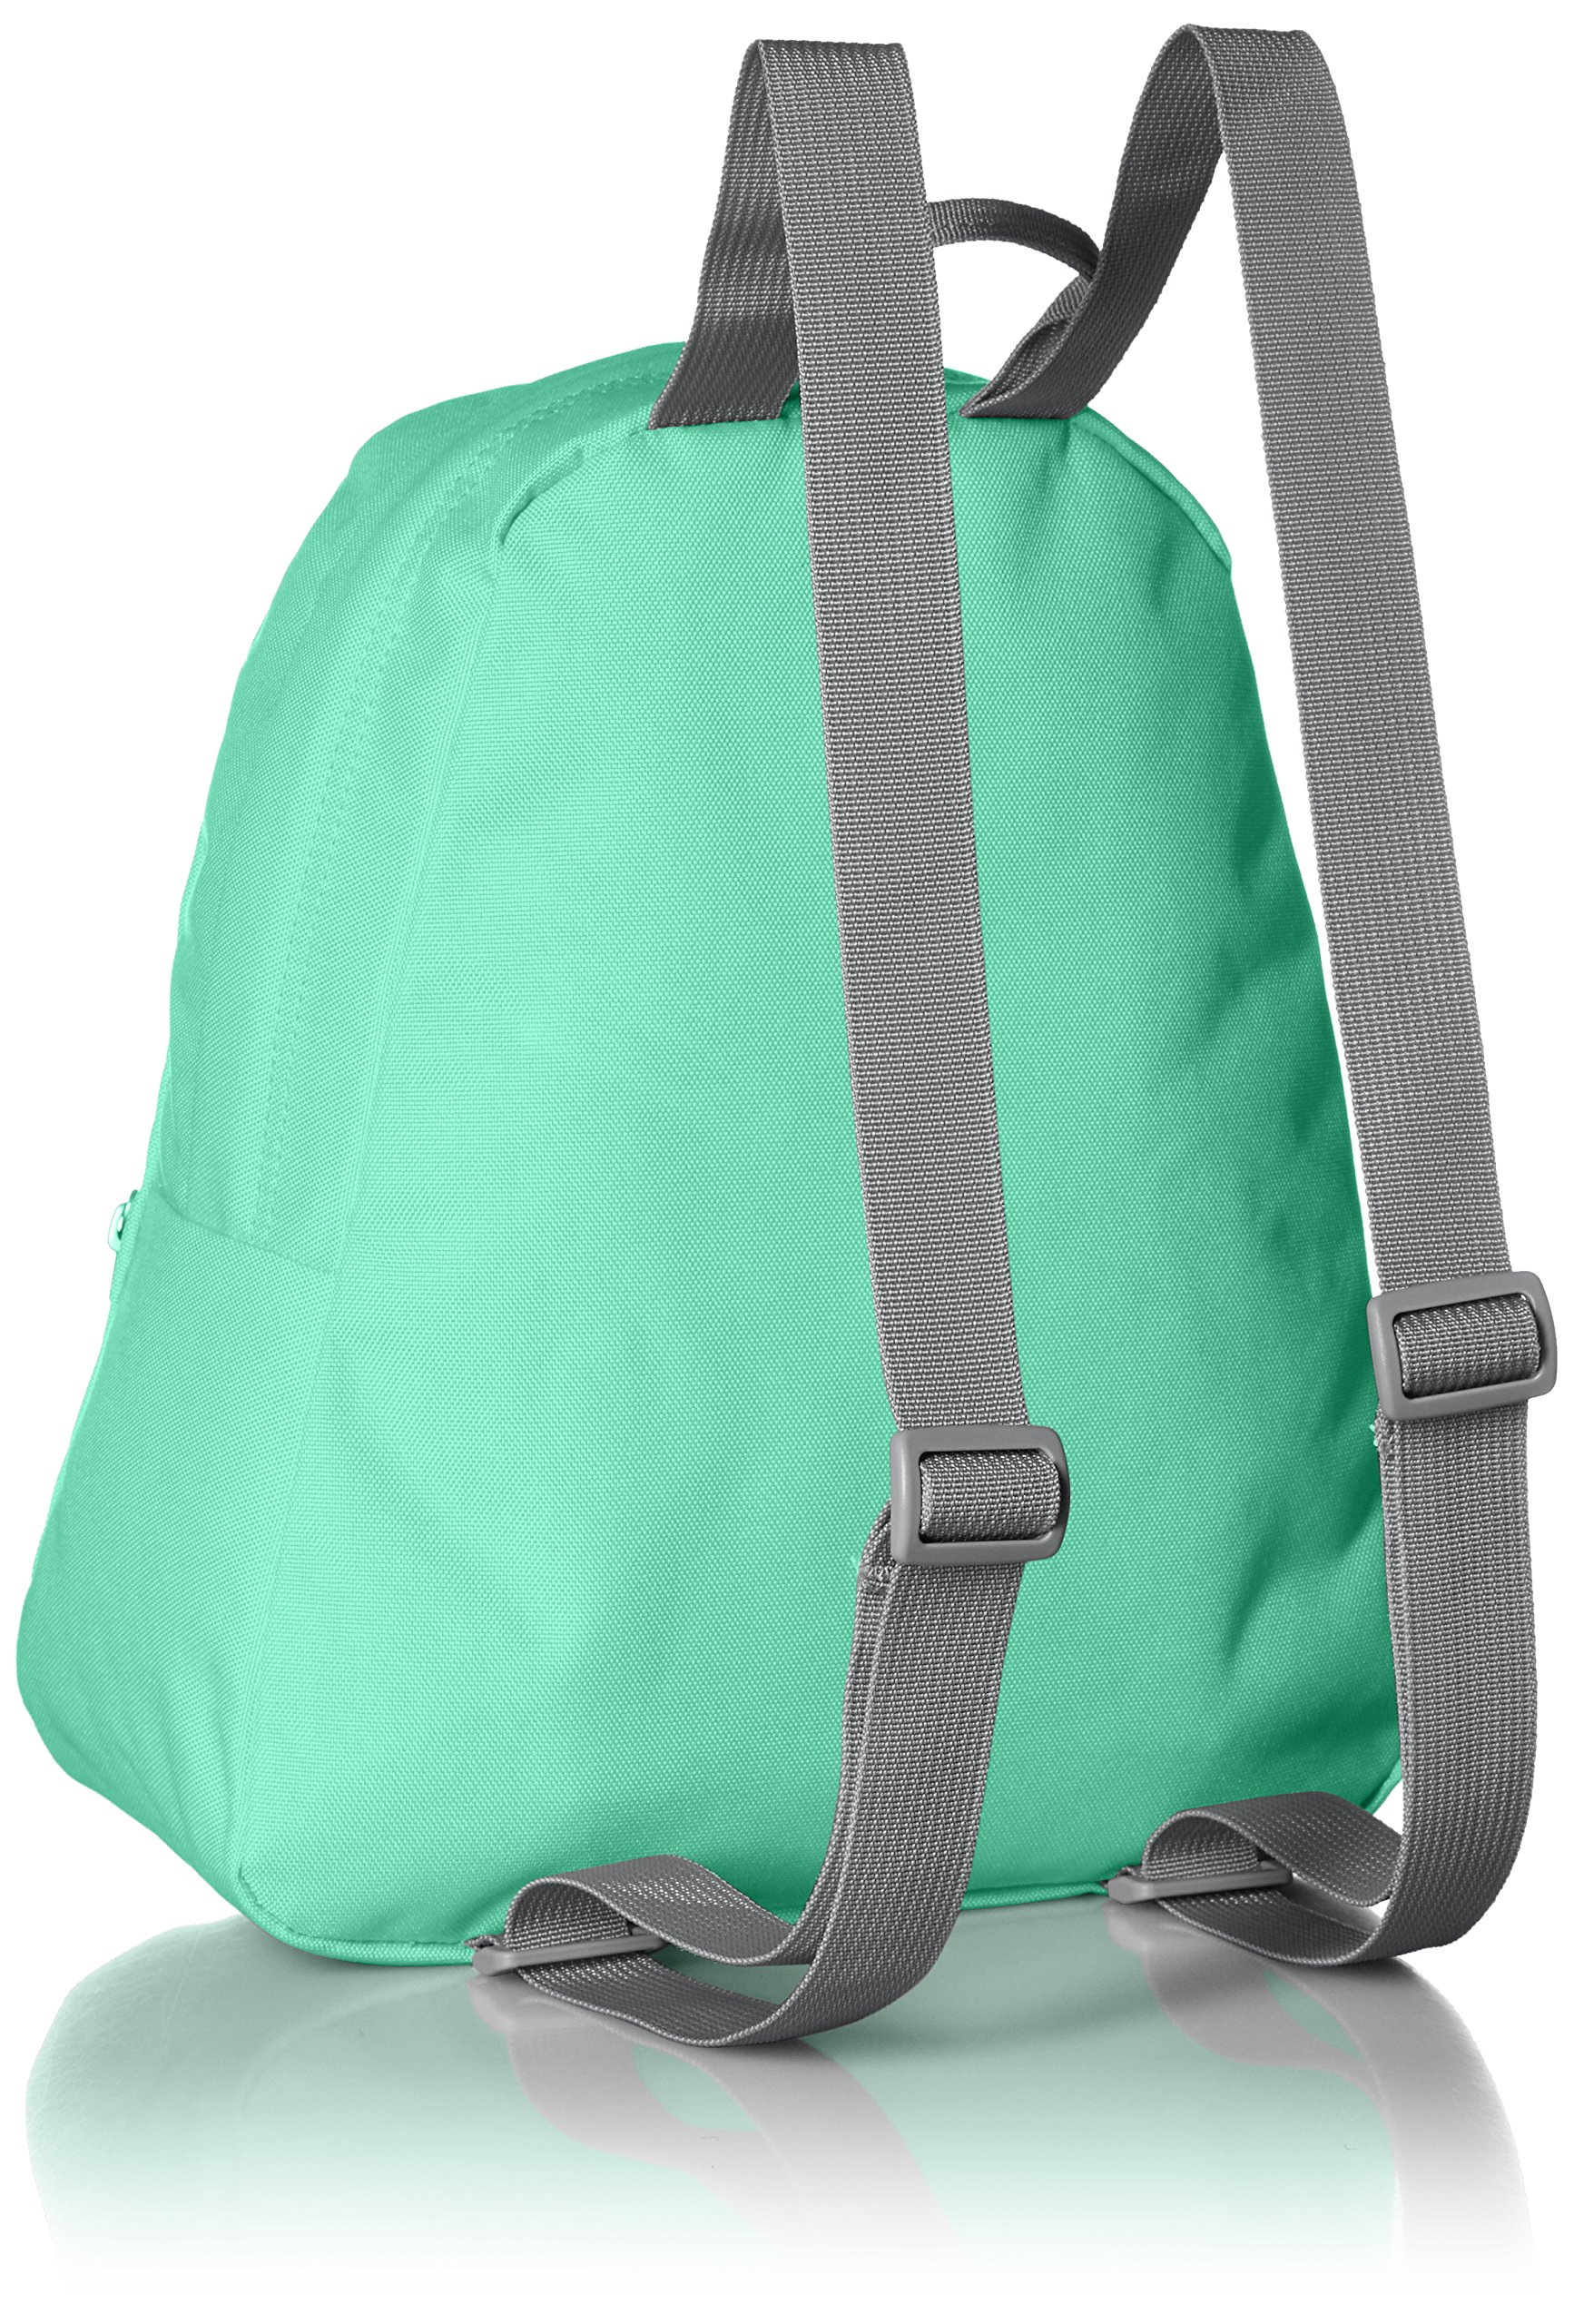 JanSport Half Pint Backpack 625cu in Seafoam Green, One Size